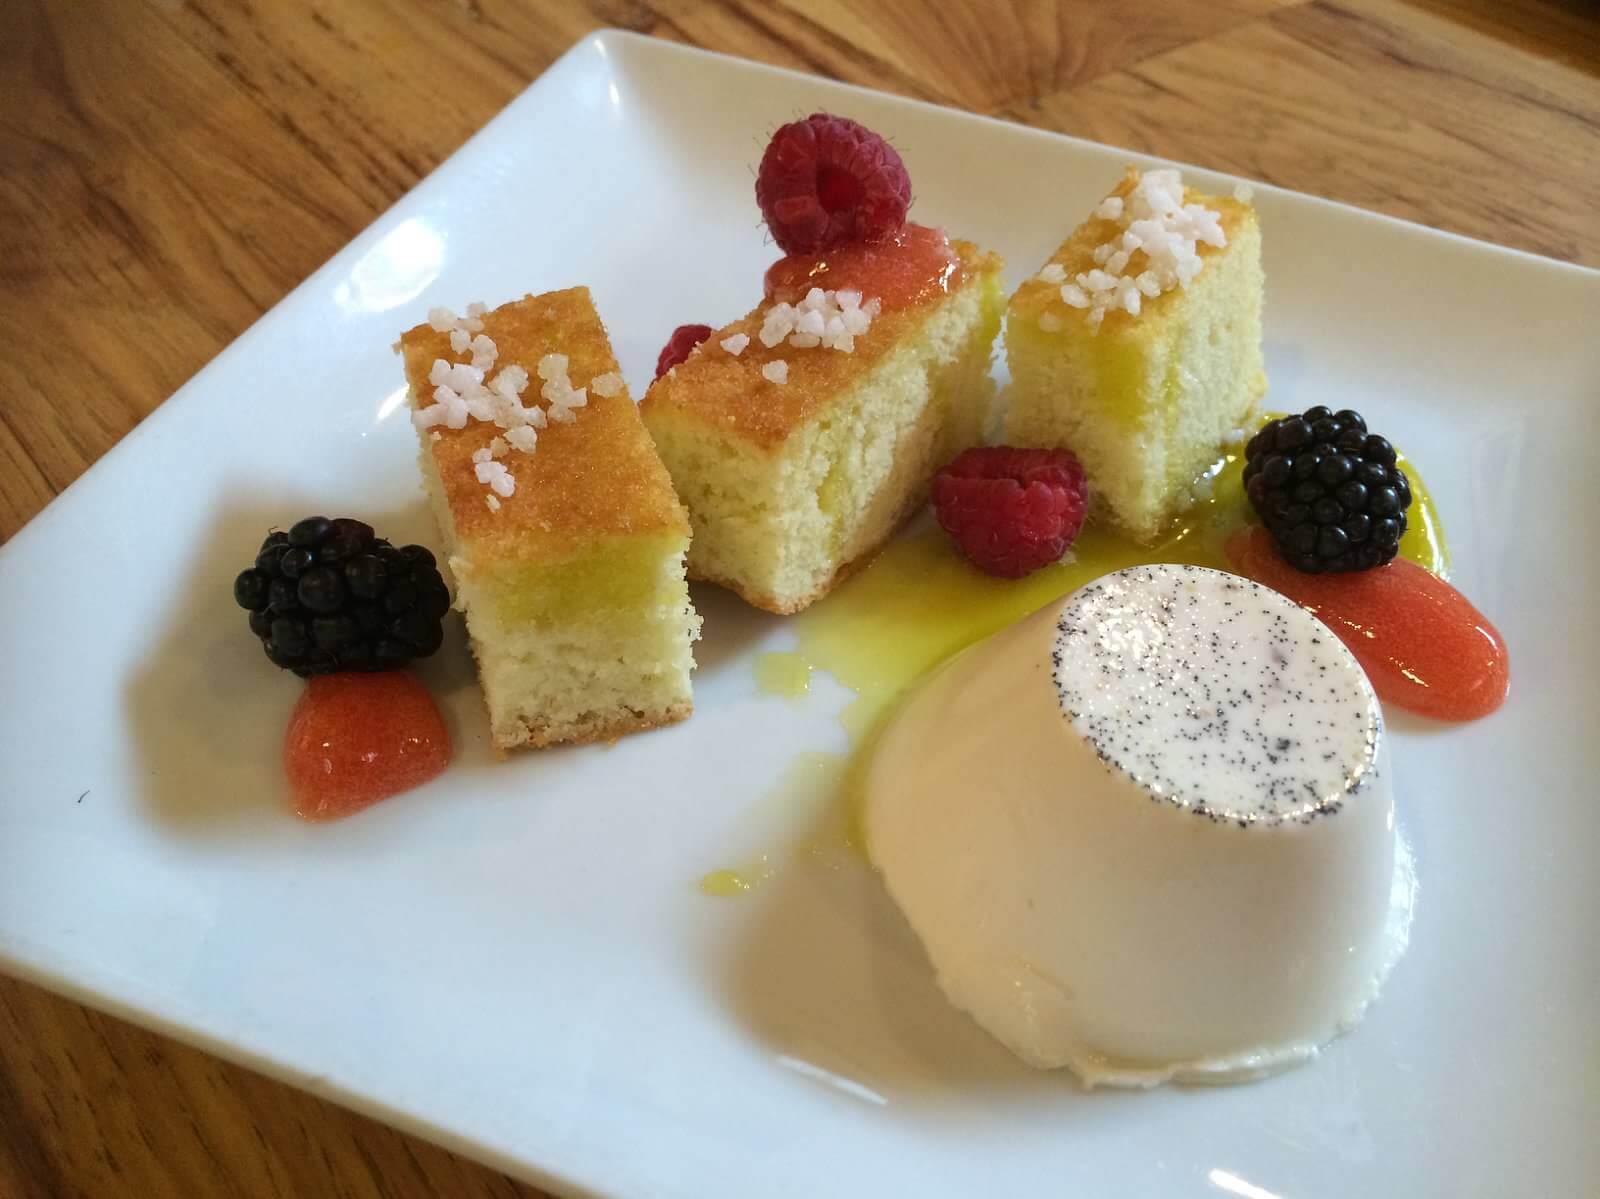 Olive oil cake, vanilla panna cotta, rhubarb gel